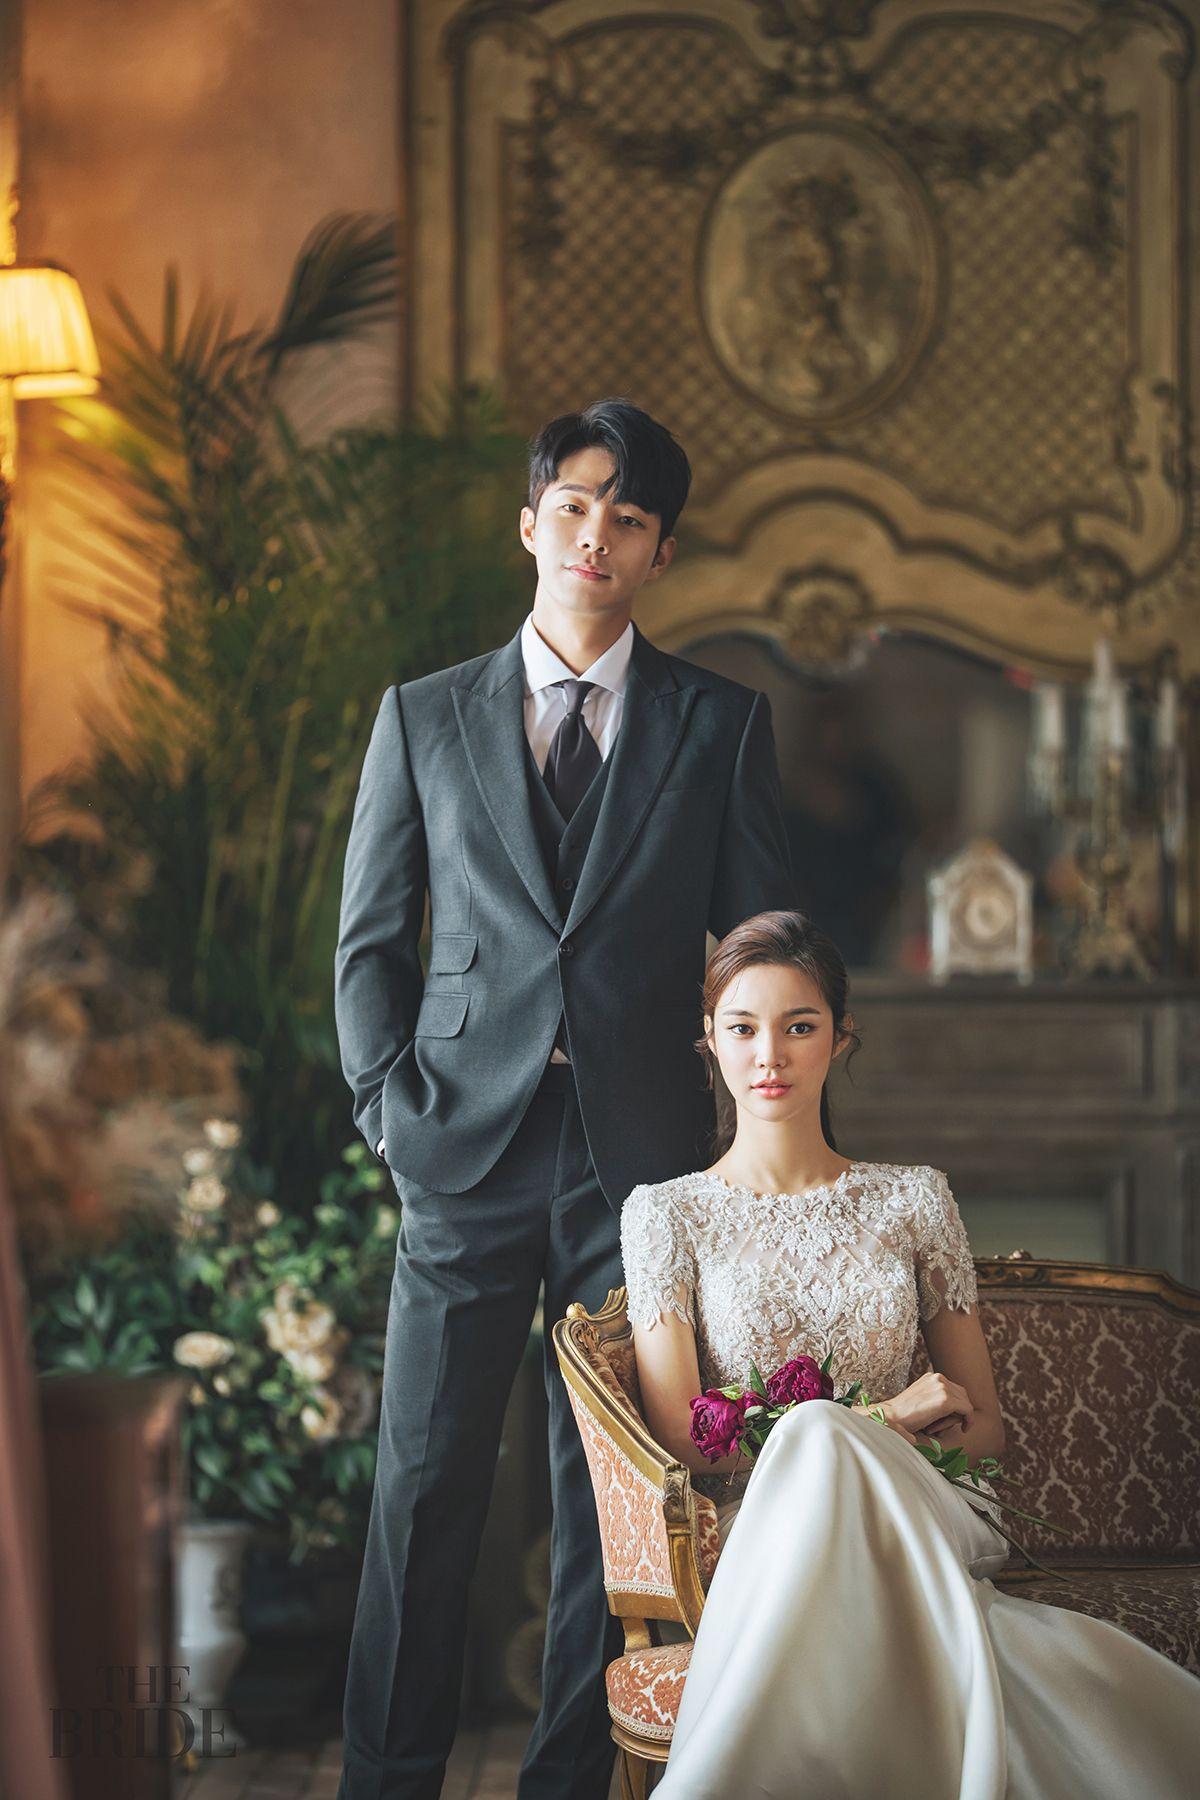 Korea Indoor Pre Wedding C 023 The Bride Studio Korea Wedding Pledge Foto Perkawinan Fotografi Pengantin Gaun Pengantin Sederhana